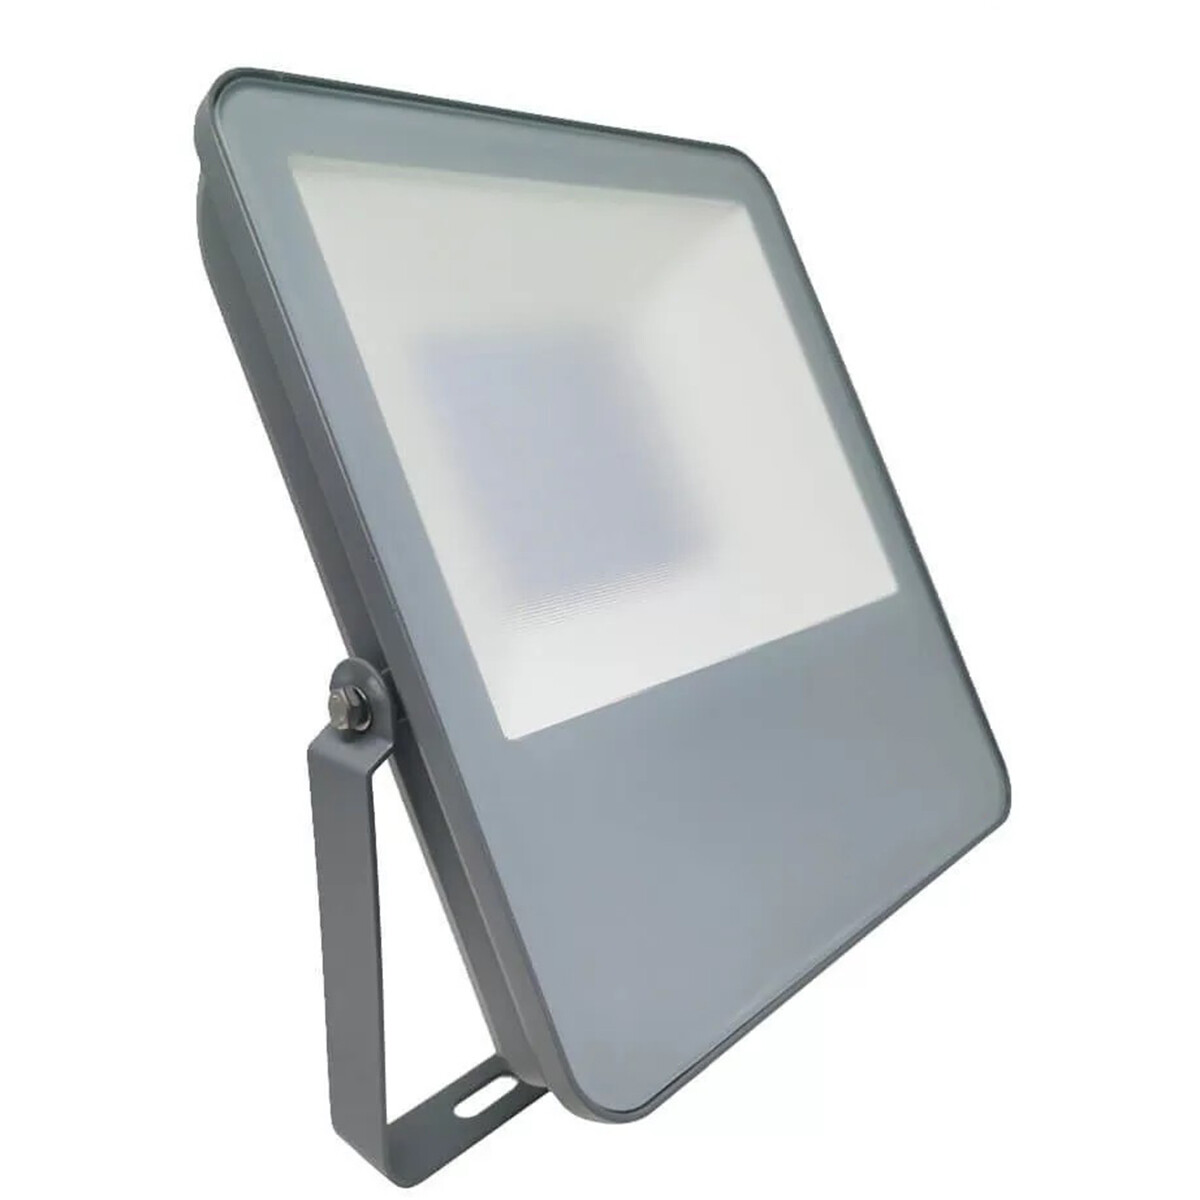 OSRAM - LED Bouwlamp - Facto Evola - 100 Watt - LED Schijnwerper - Warm Wit 3000K - Waterdicht IP65